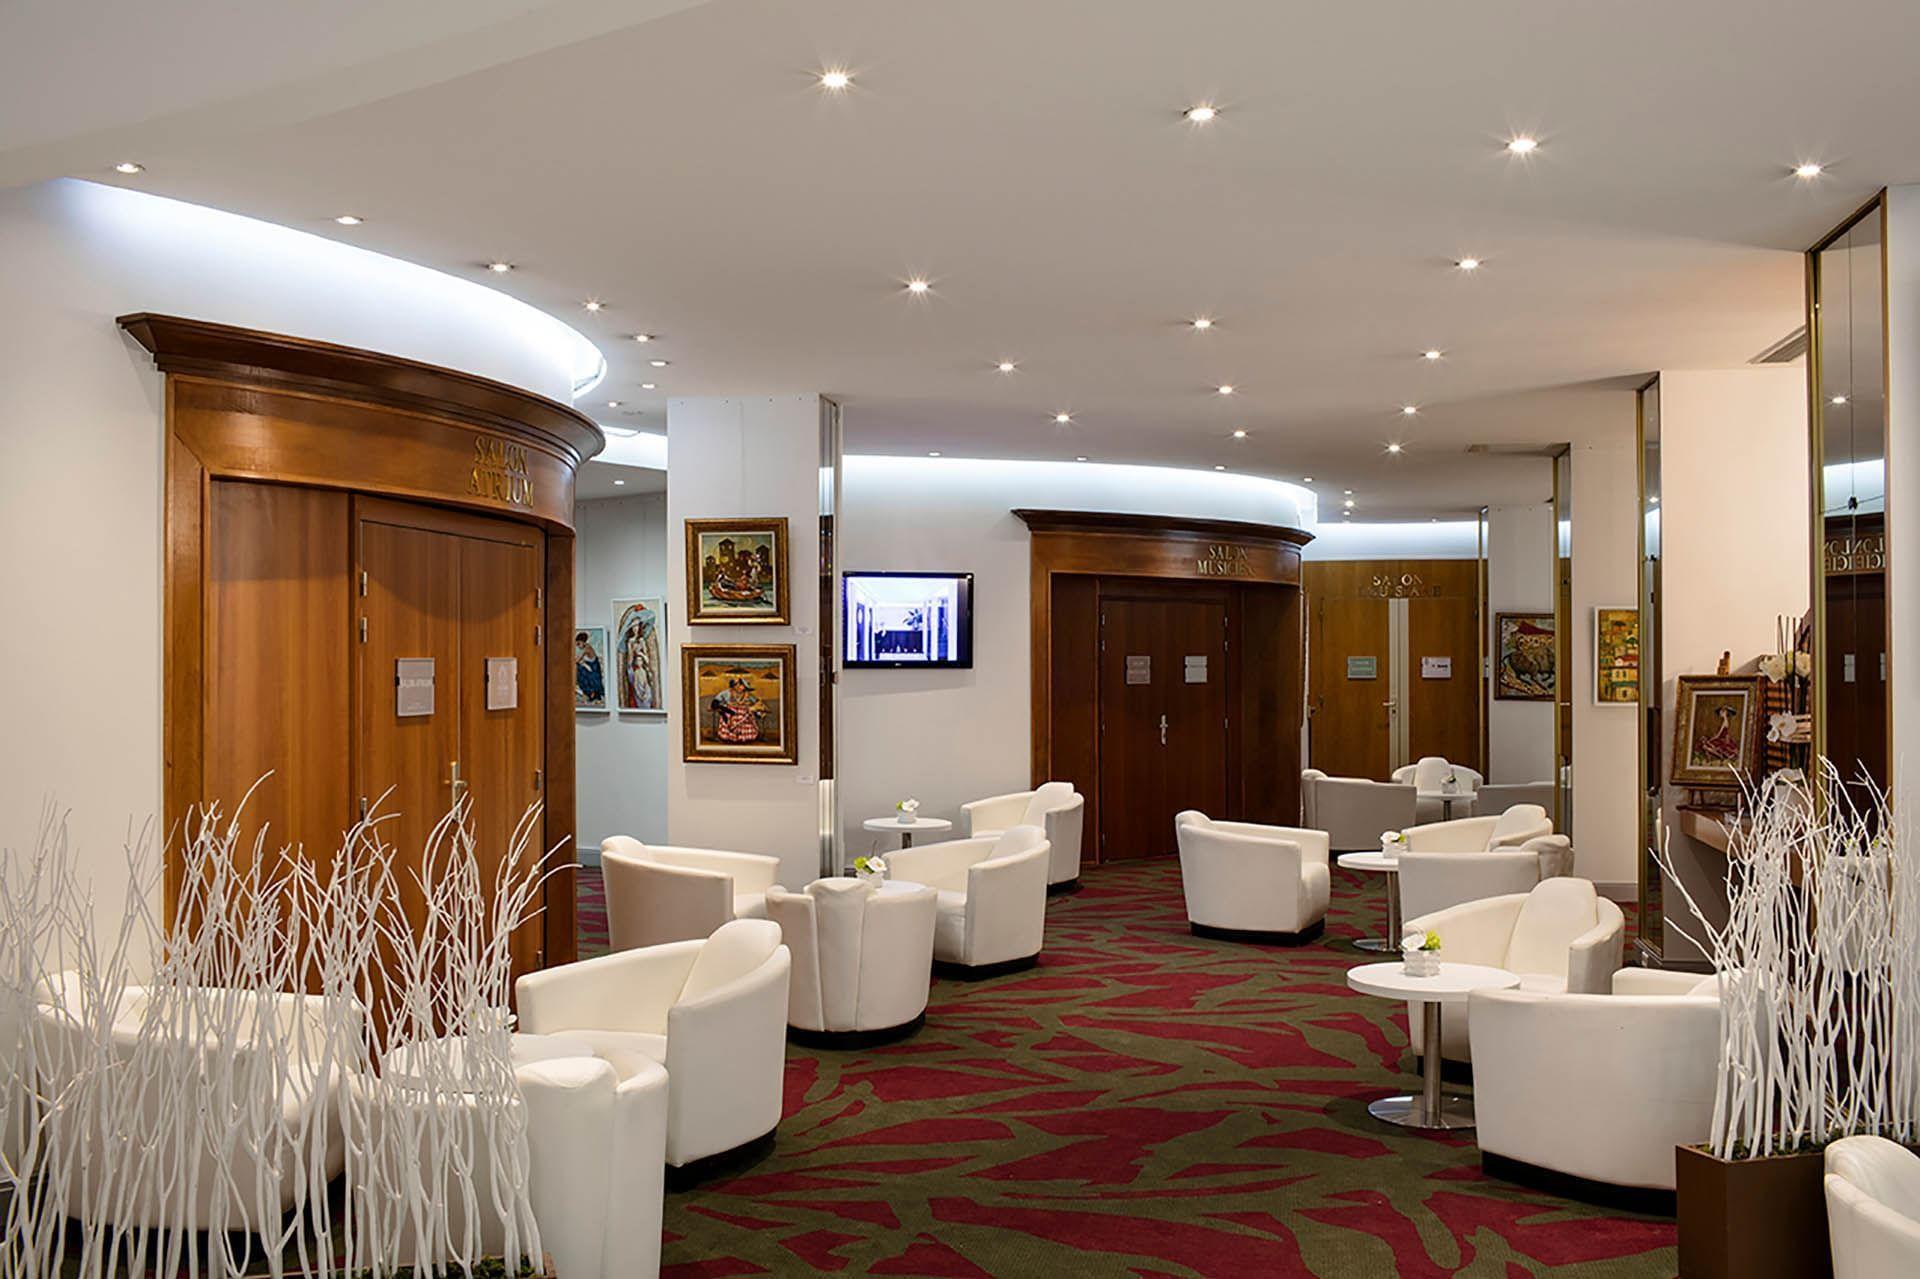 Lobby at Splendid Hotel and Spa